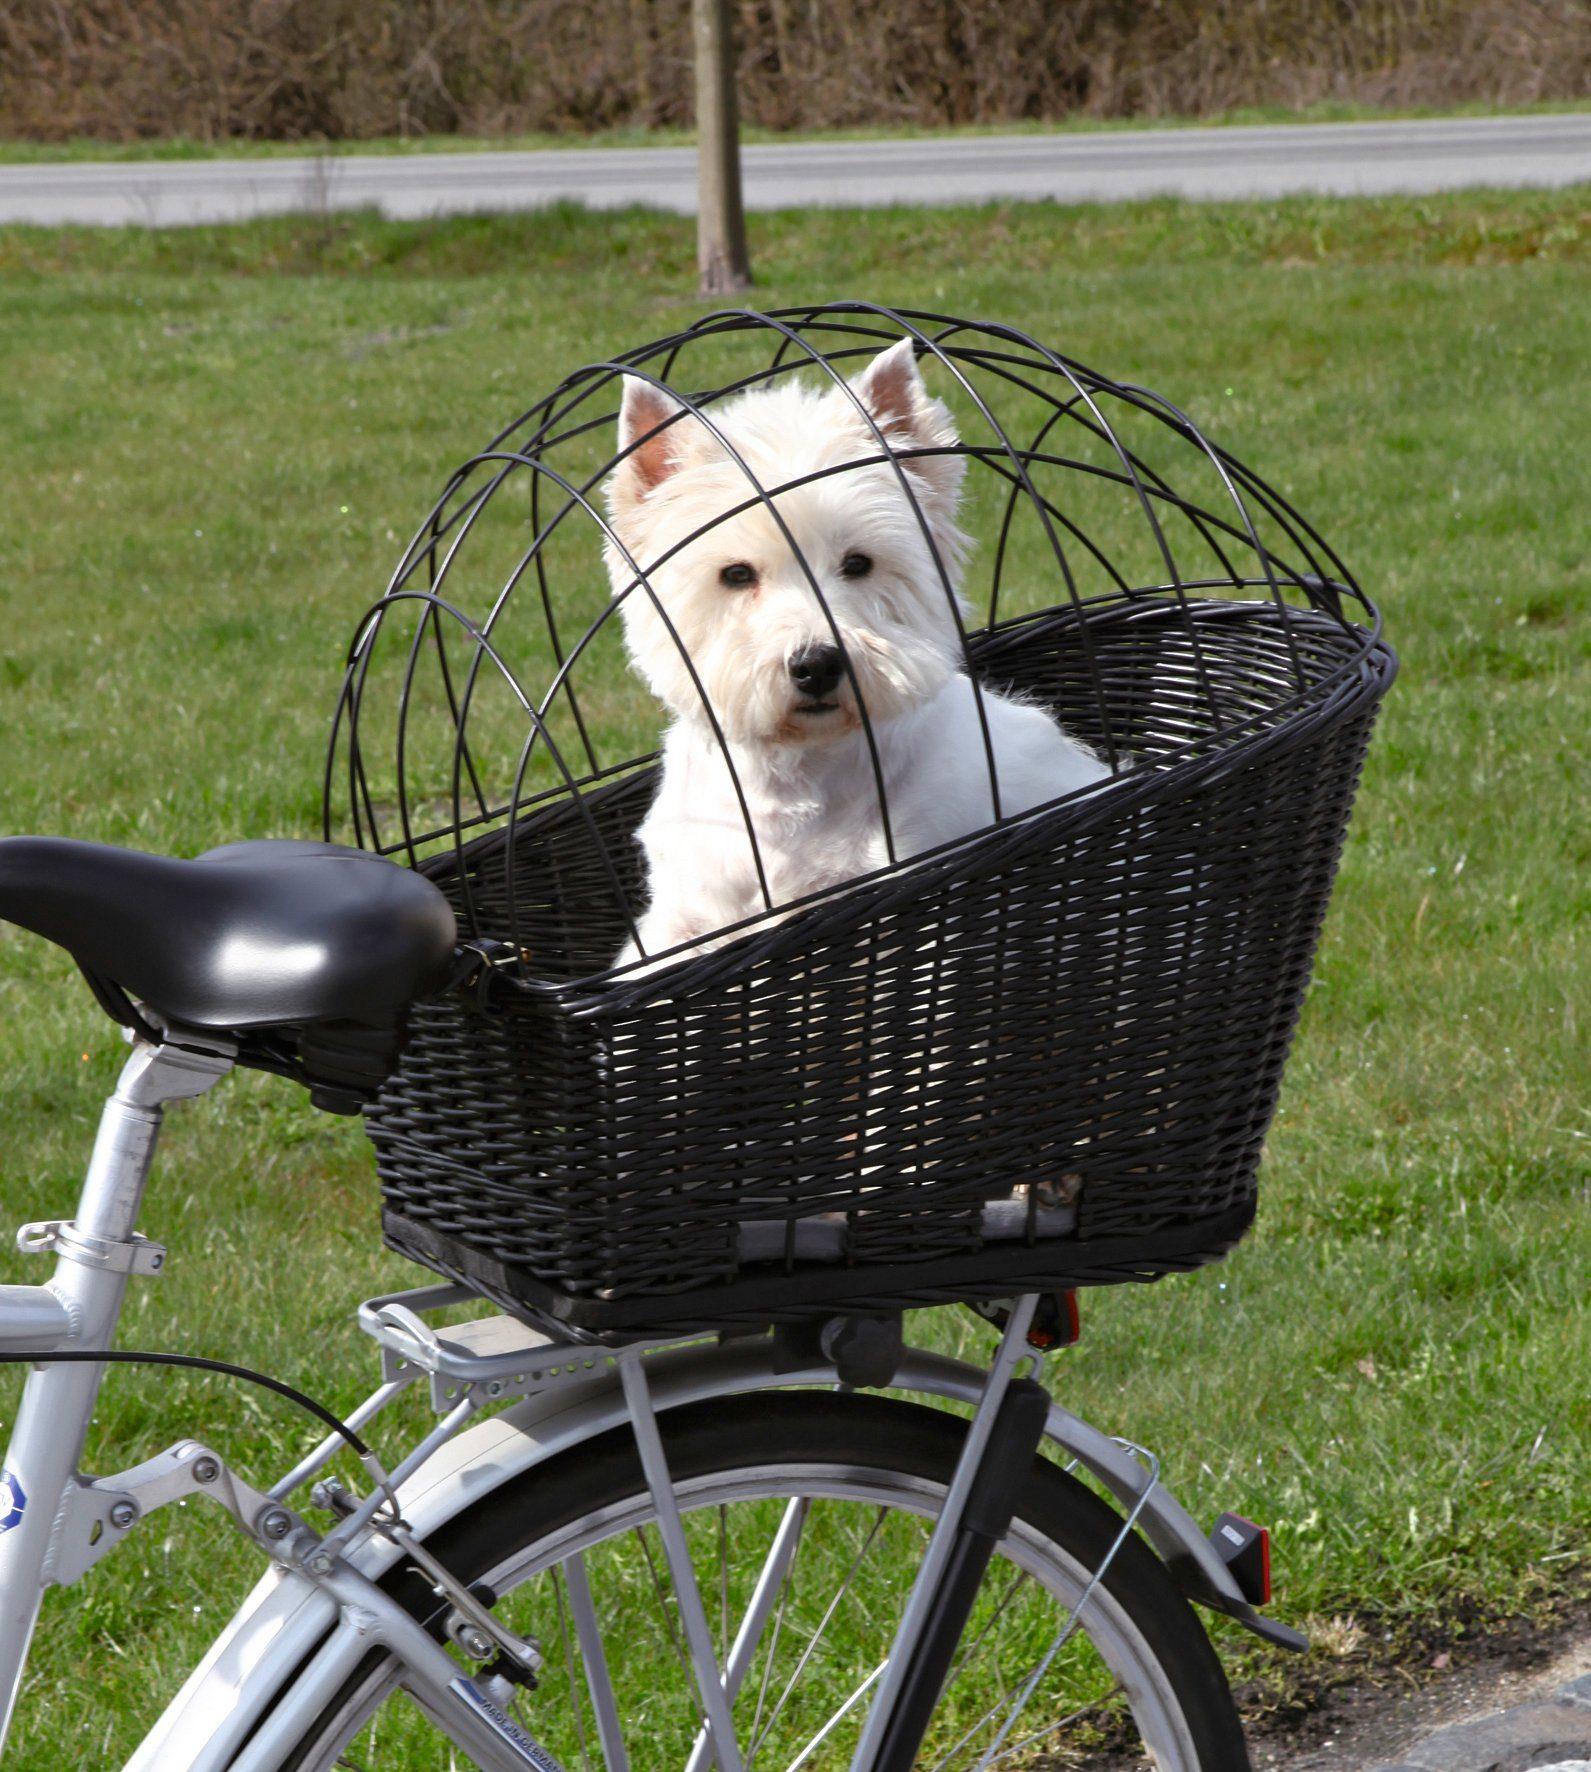 Trixie Hunde-Fahrradkorb, B/T/H: 35/55/49 cm, bis zu 12 kg